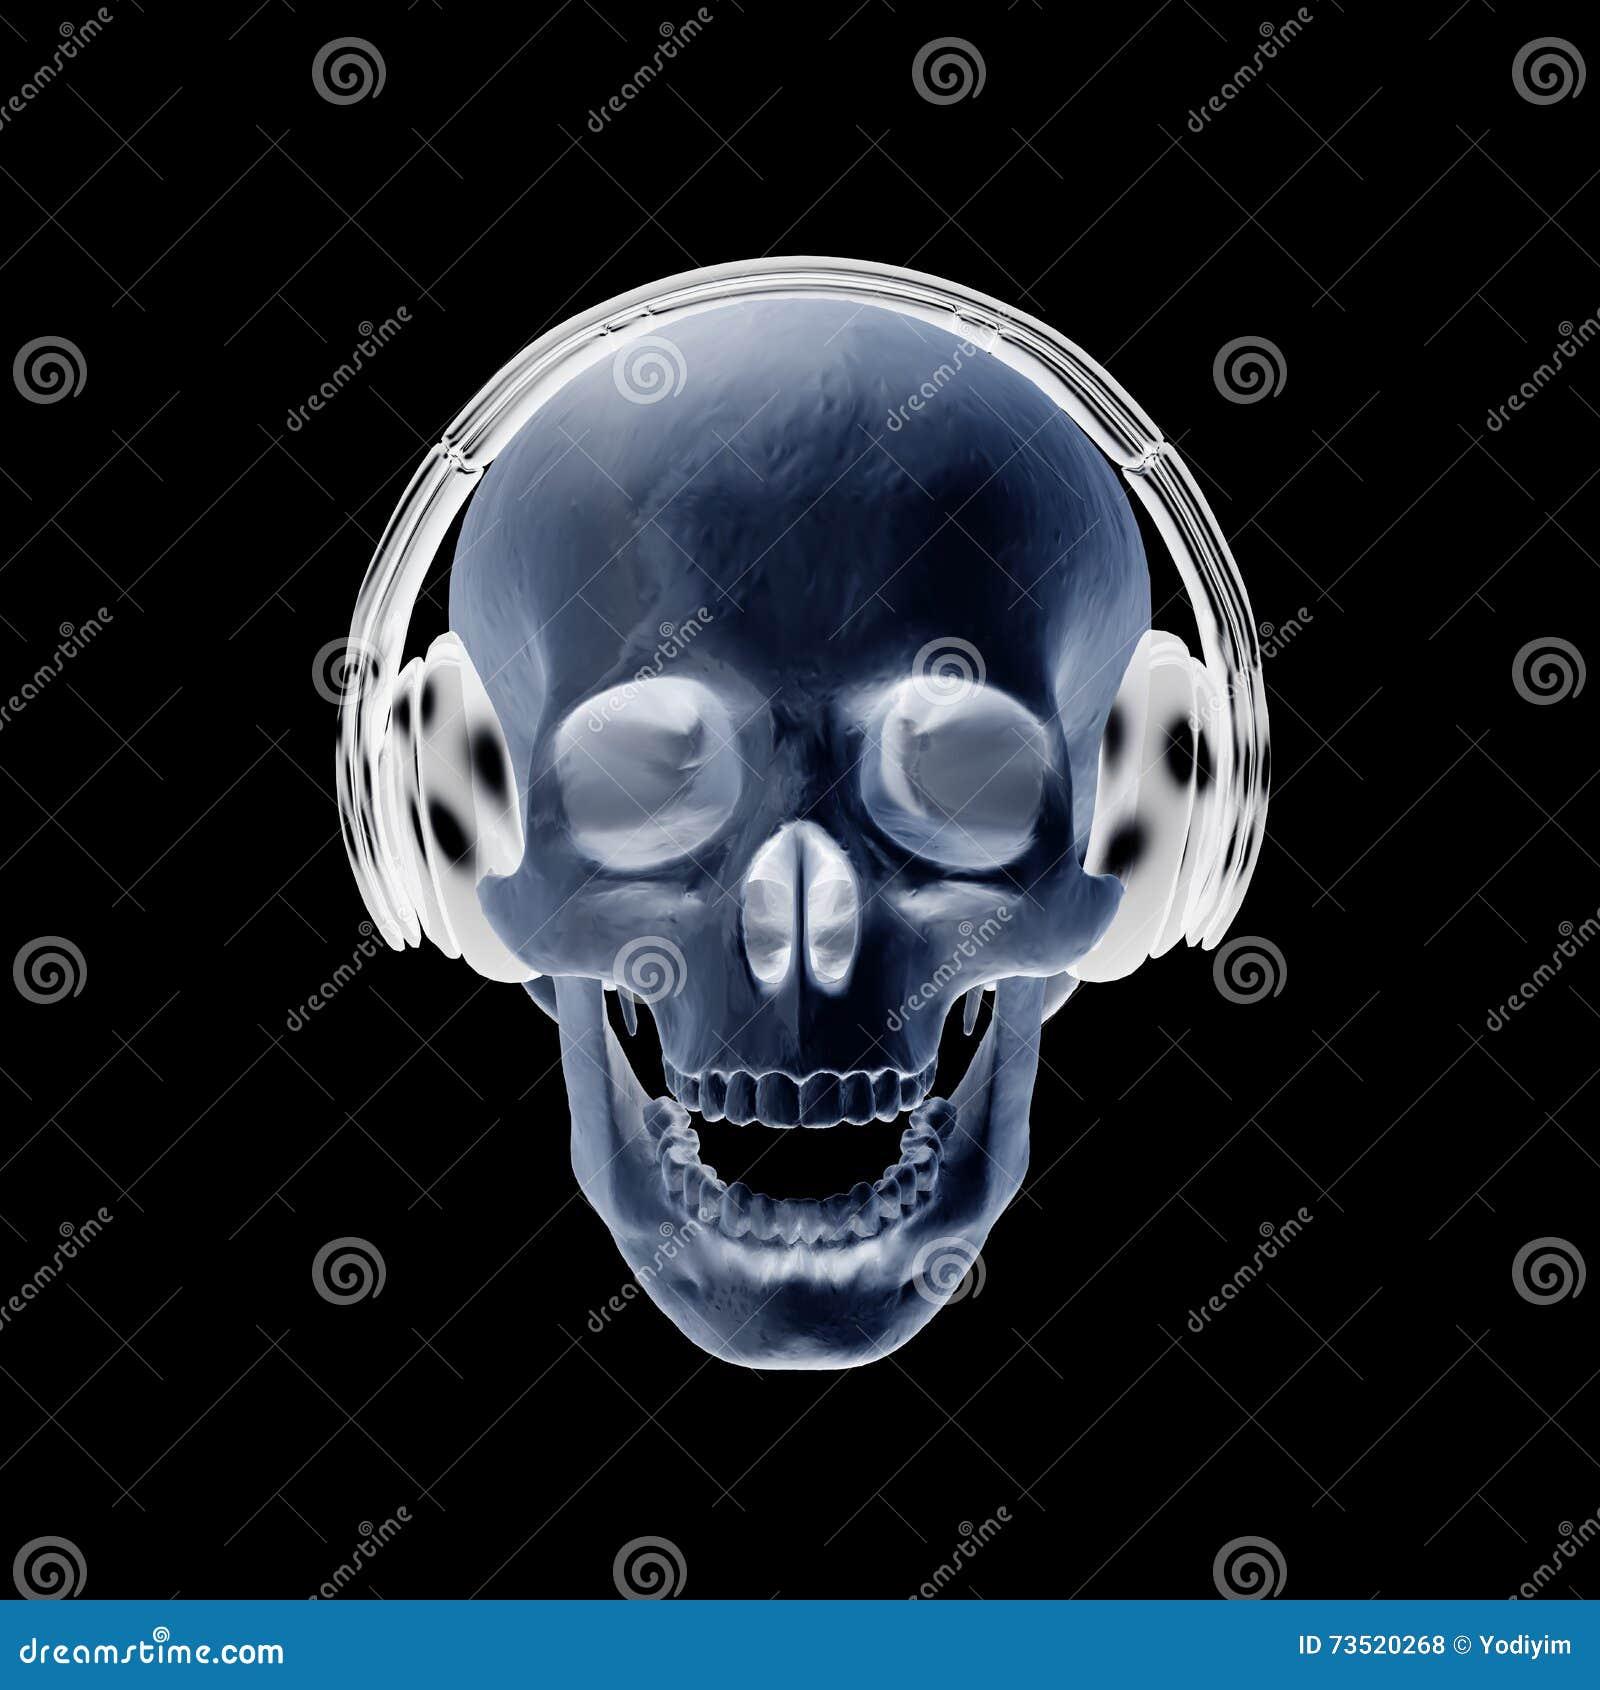 3d illustration abstract skull with headphone. stock illustration